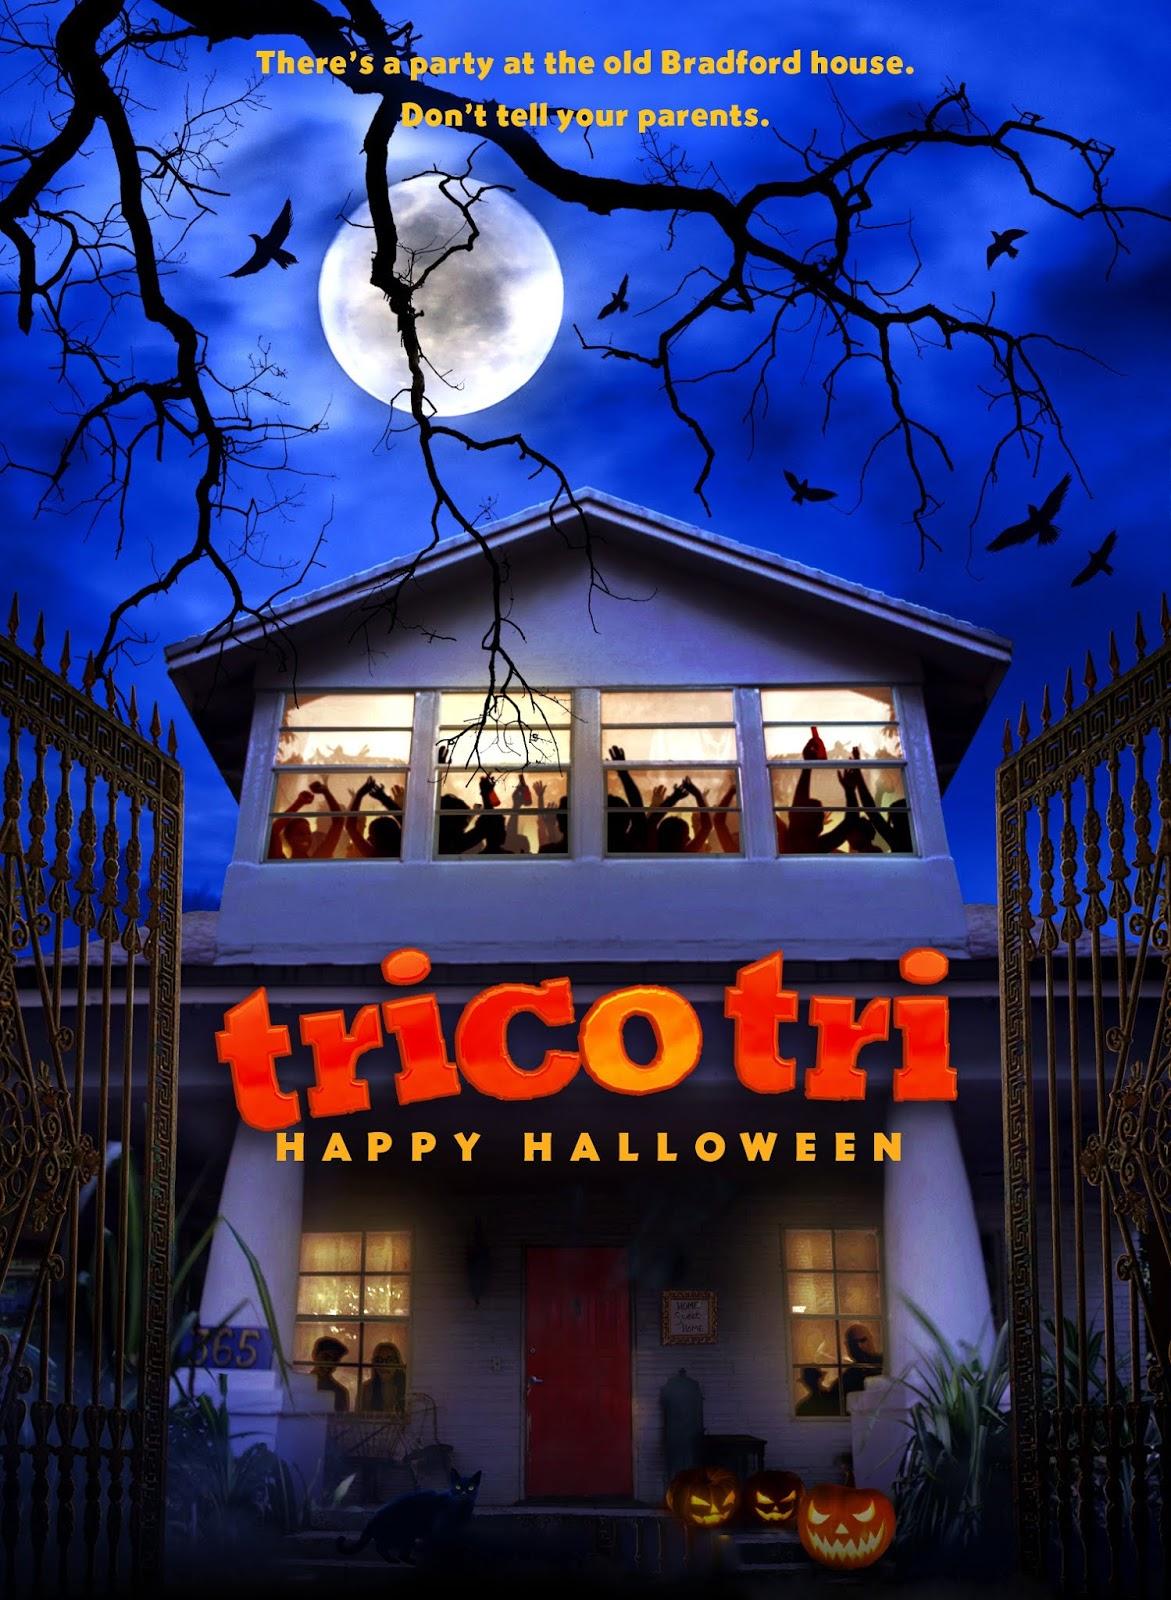 Trico Tri Happy Halloween [2018] [CUSTOM HD] [DVDR] [NTSC] [Latino]